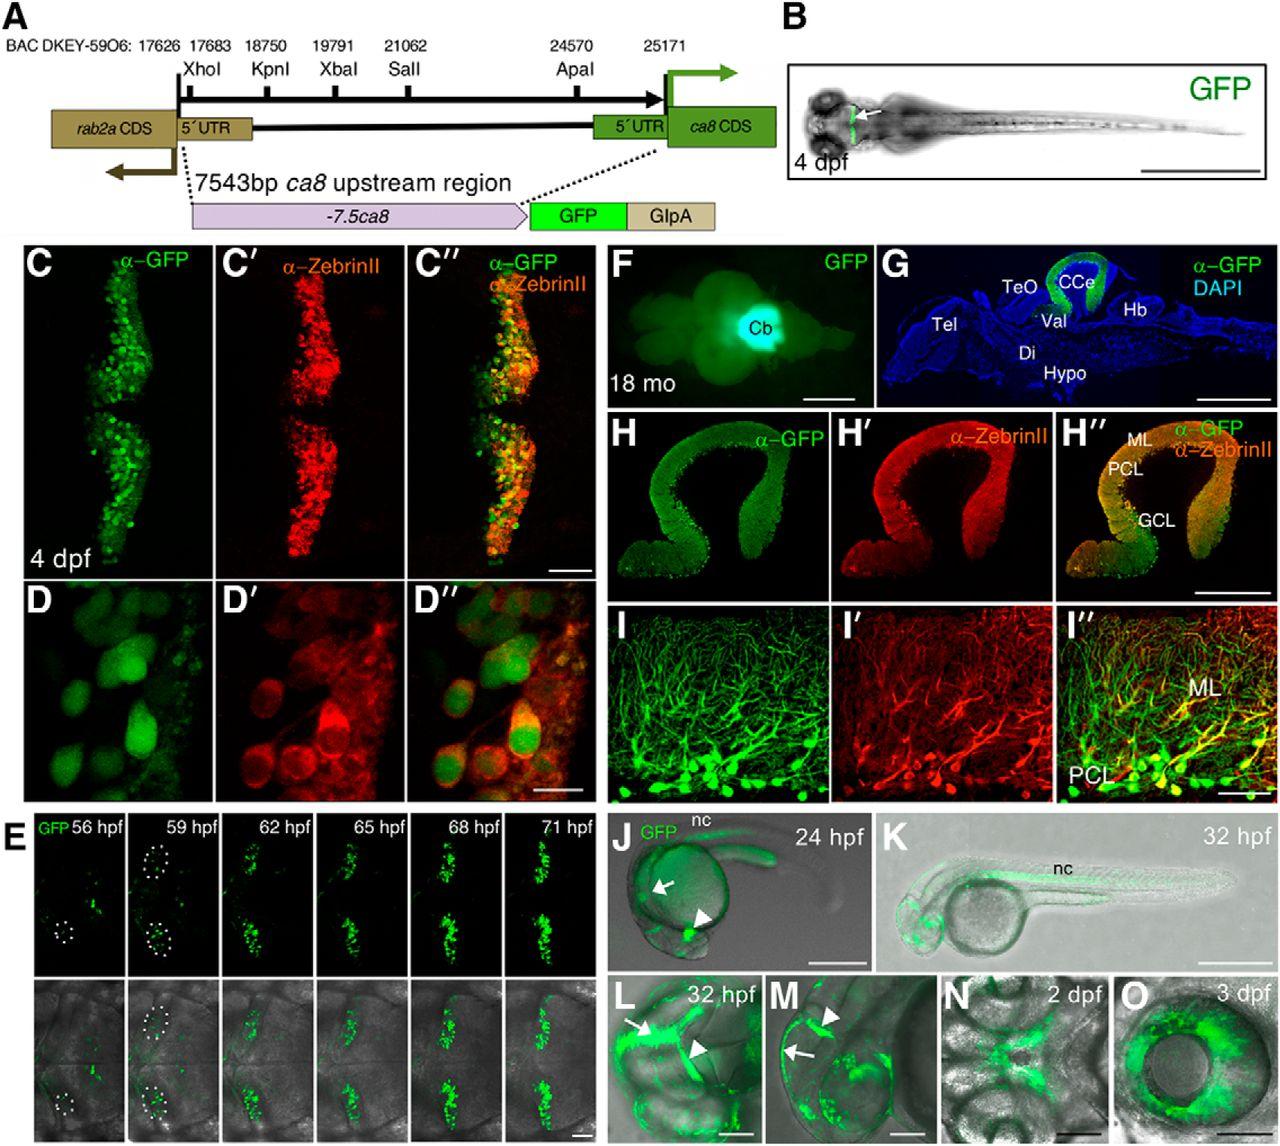 Modeling Neurodegenerative Spinocerebellar Ataxia Type 13 in